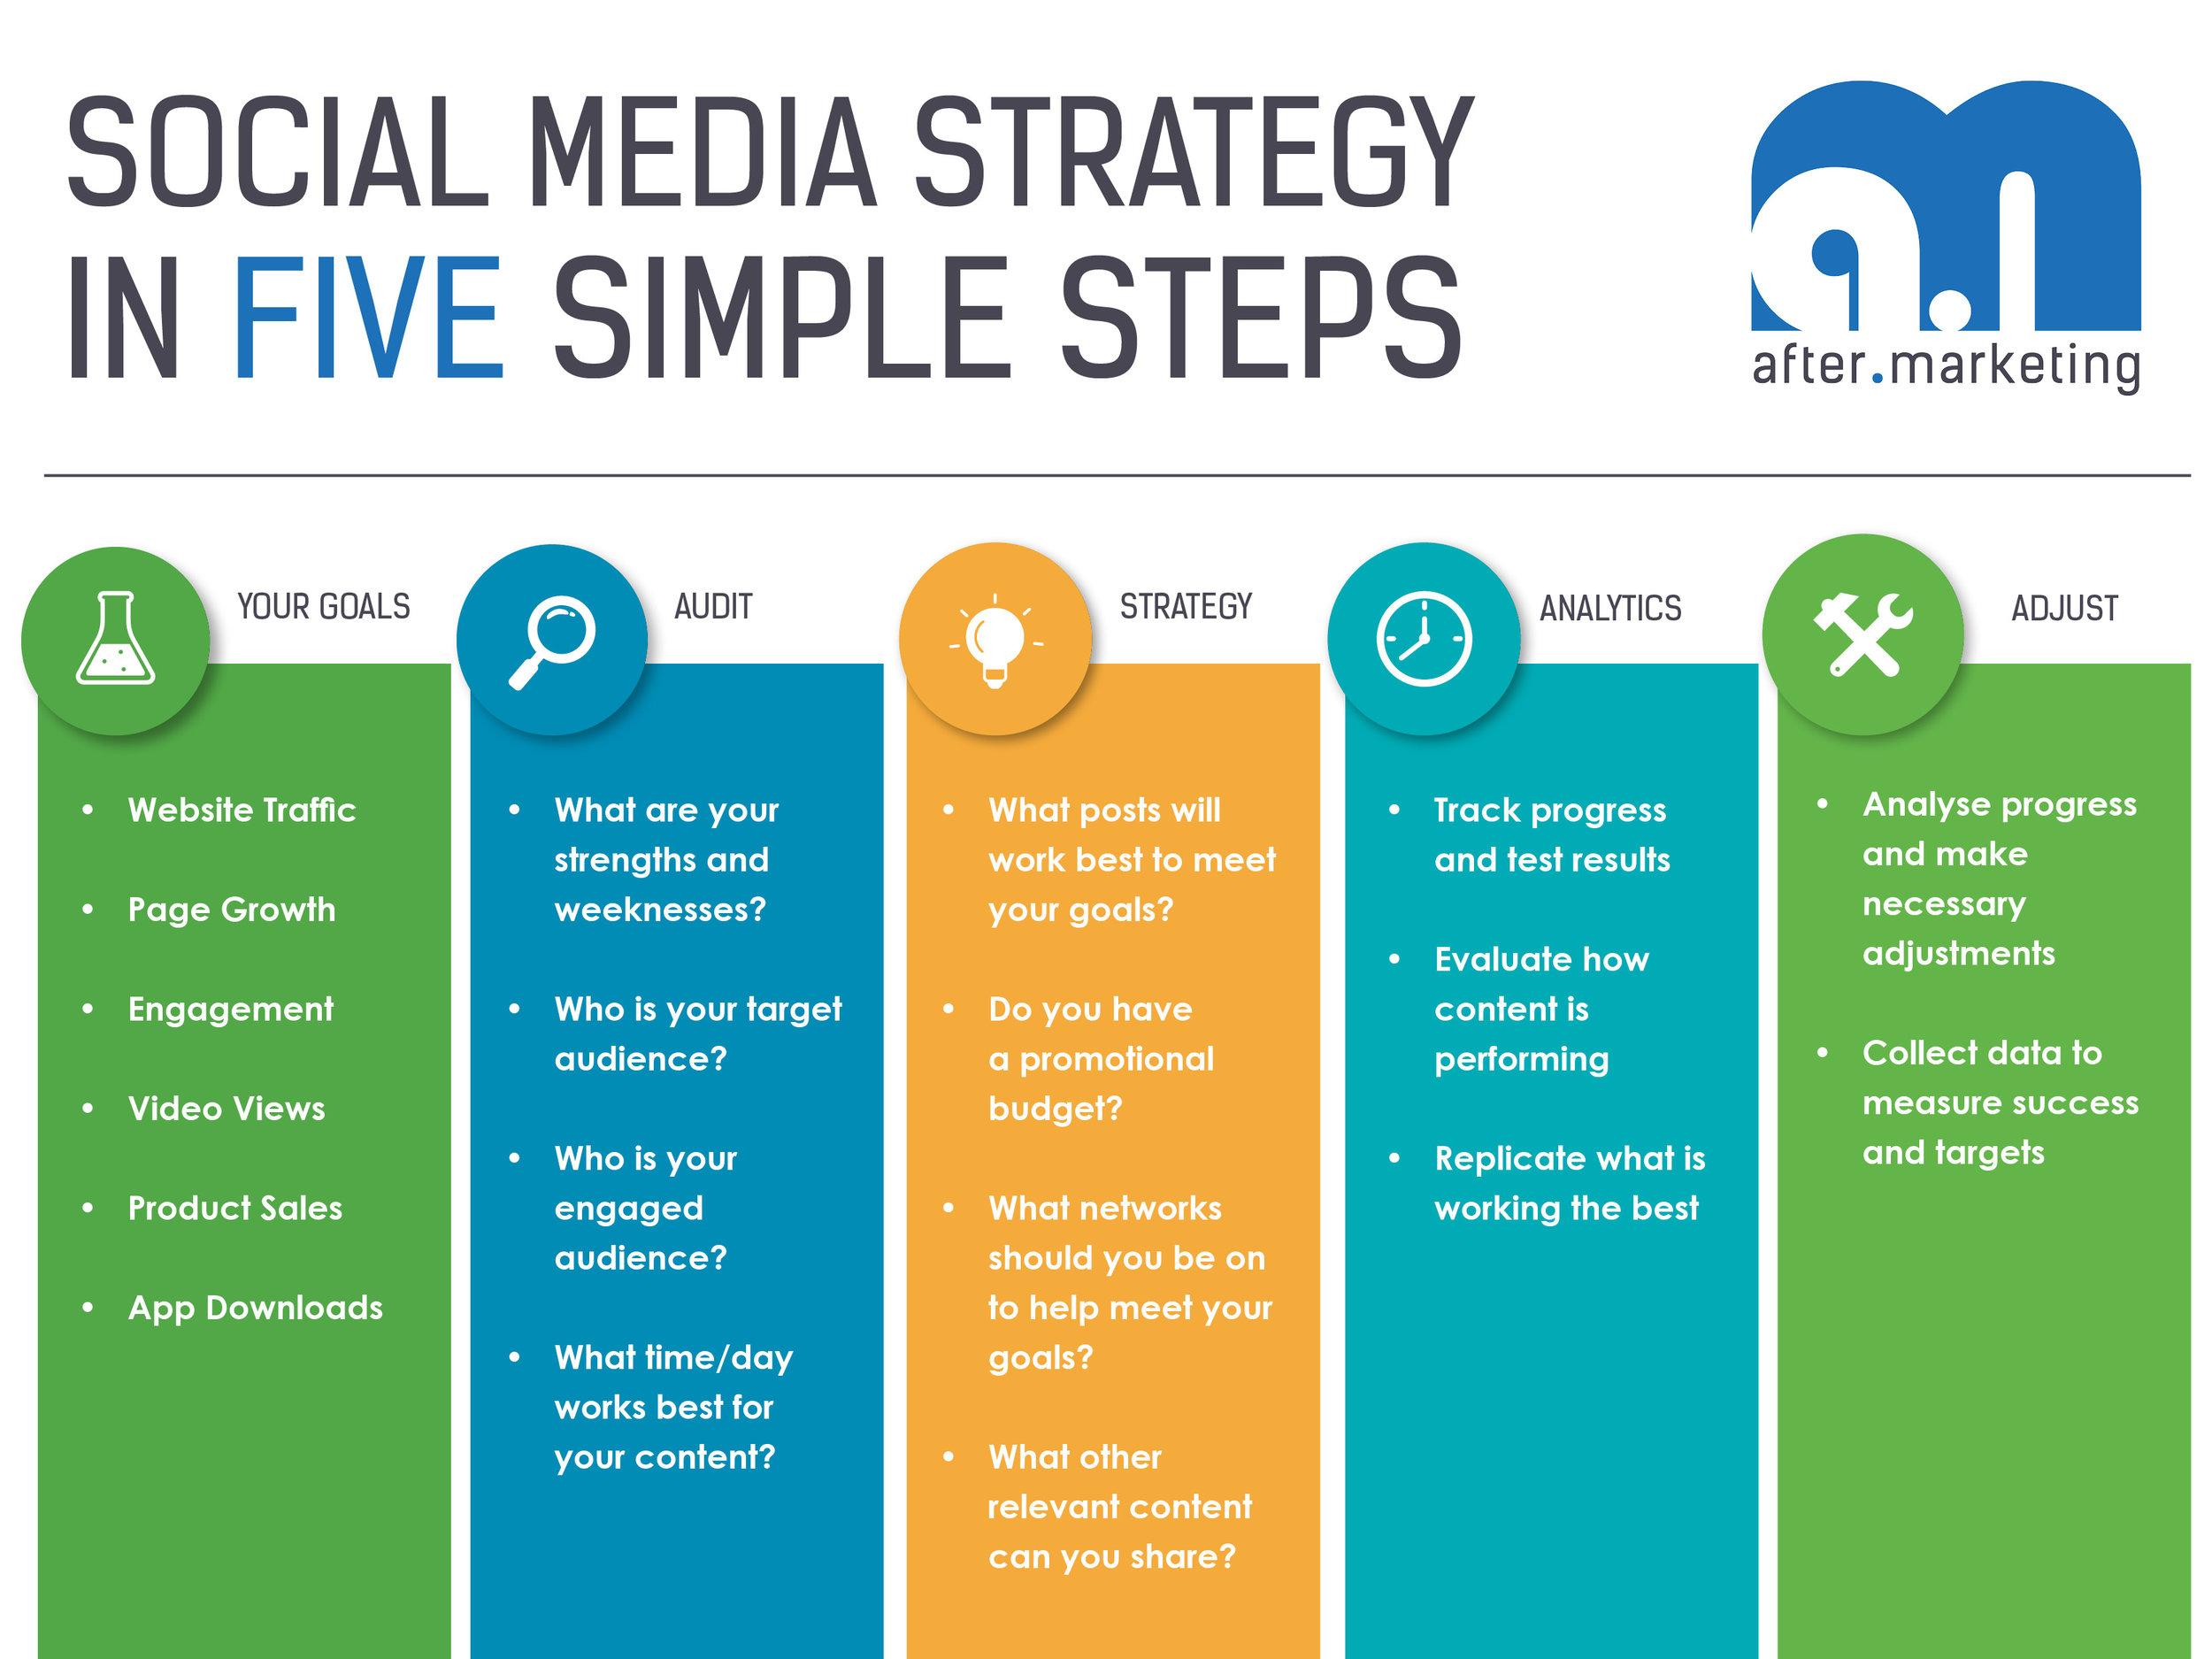 SM-Srategy-five-steps.jpg